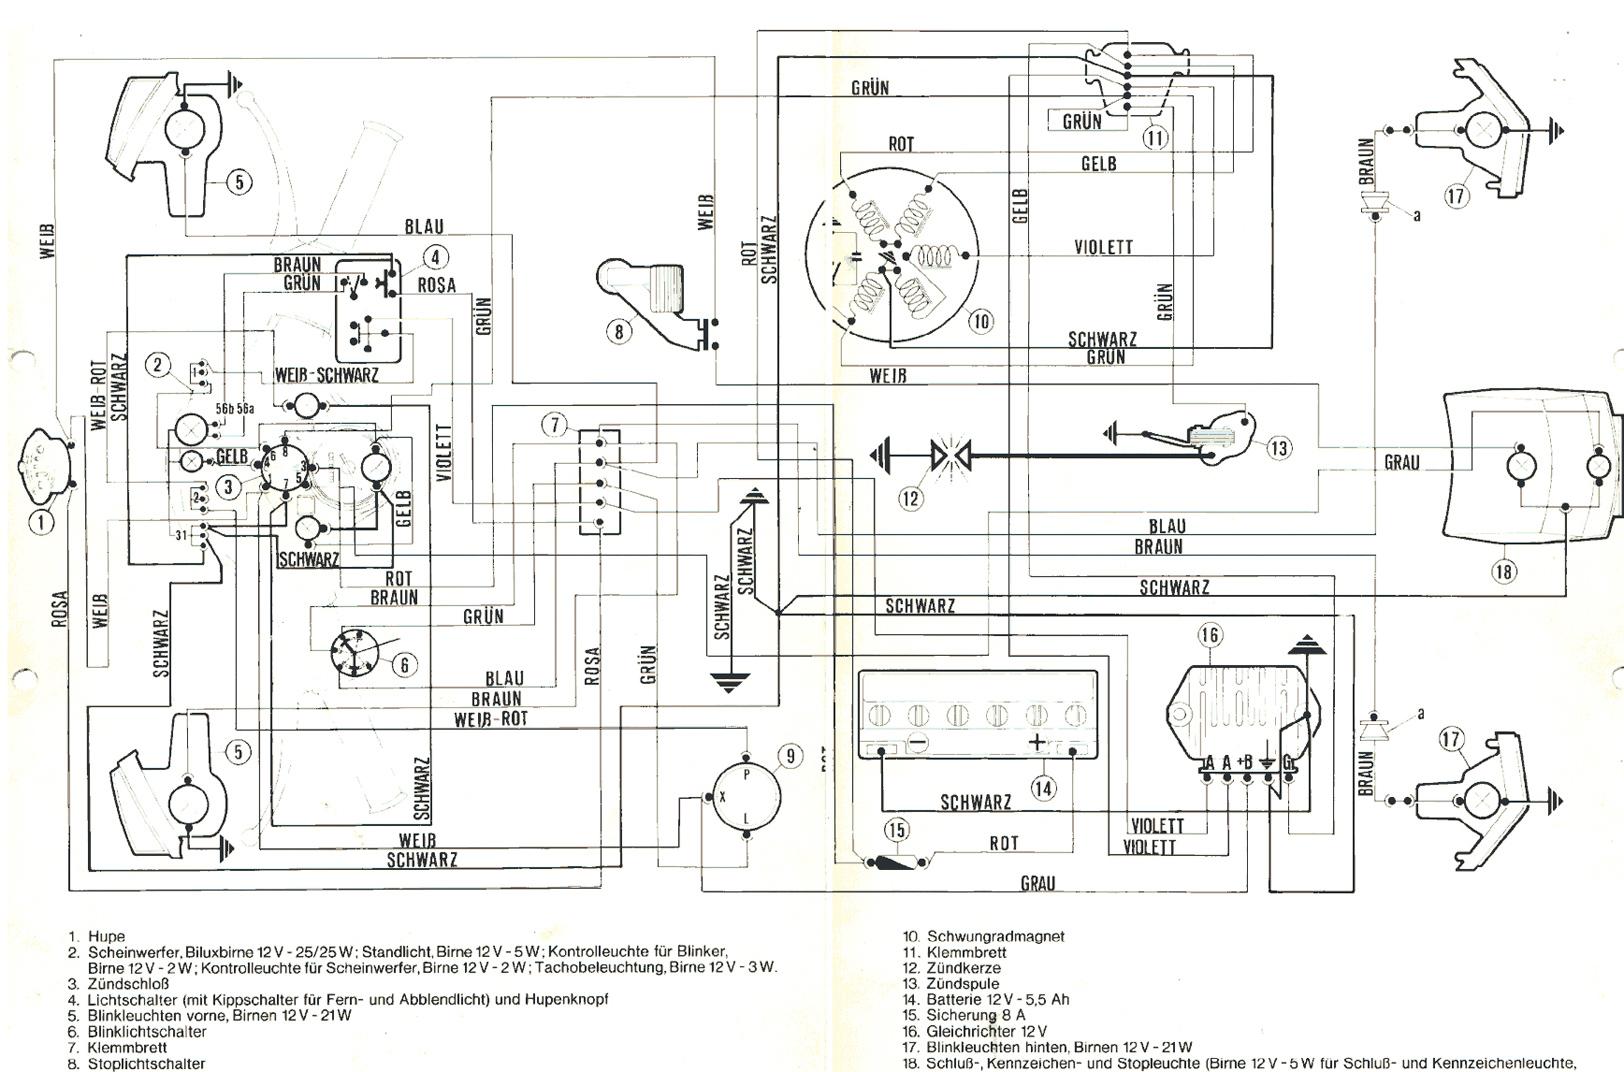 das vespa forum gt gts lx s et px thema. Black Bedroom Furniture Sets. Home Design Ideas